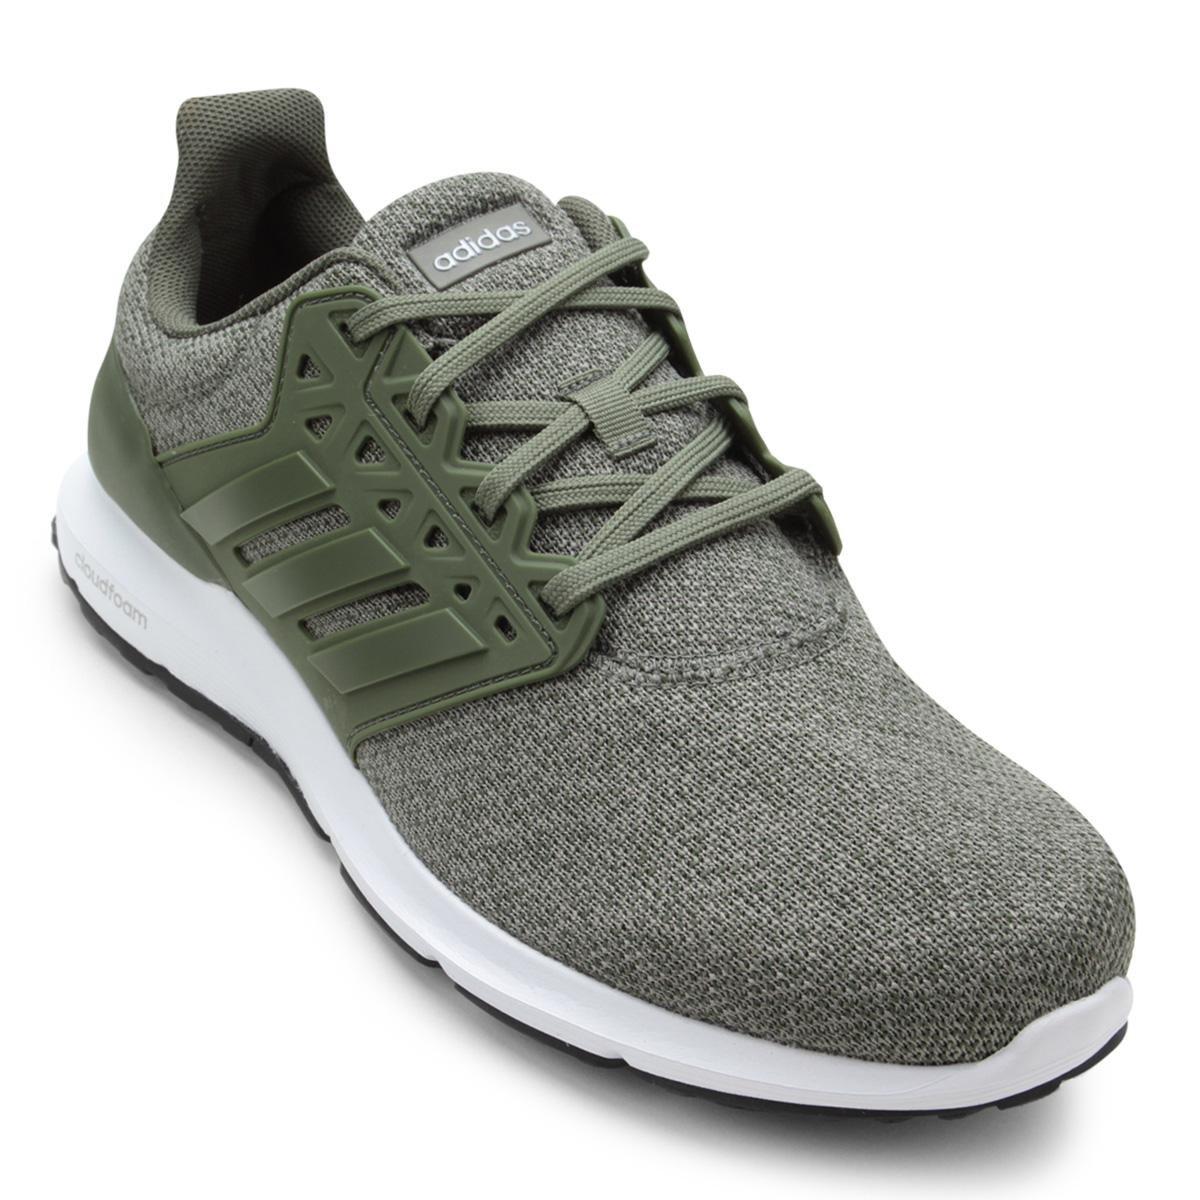 1adeed8d53c Tênis Adidas Solyx Masculino - Verde - Compre Agora